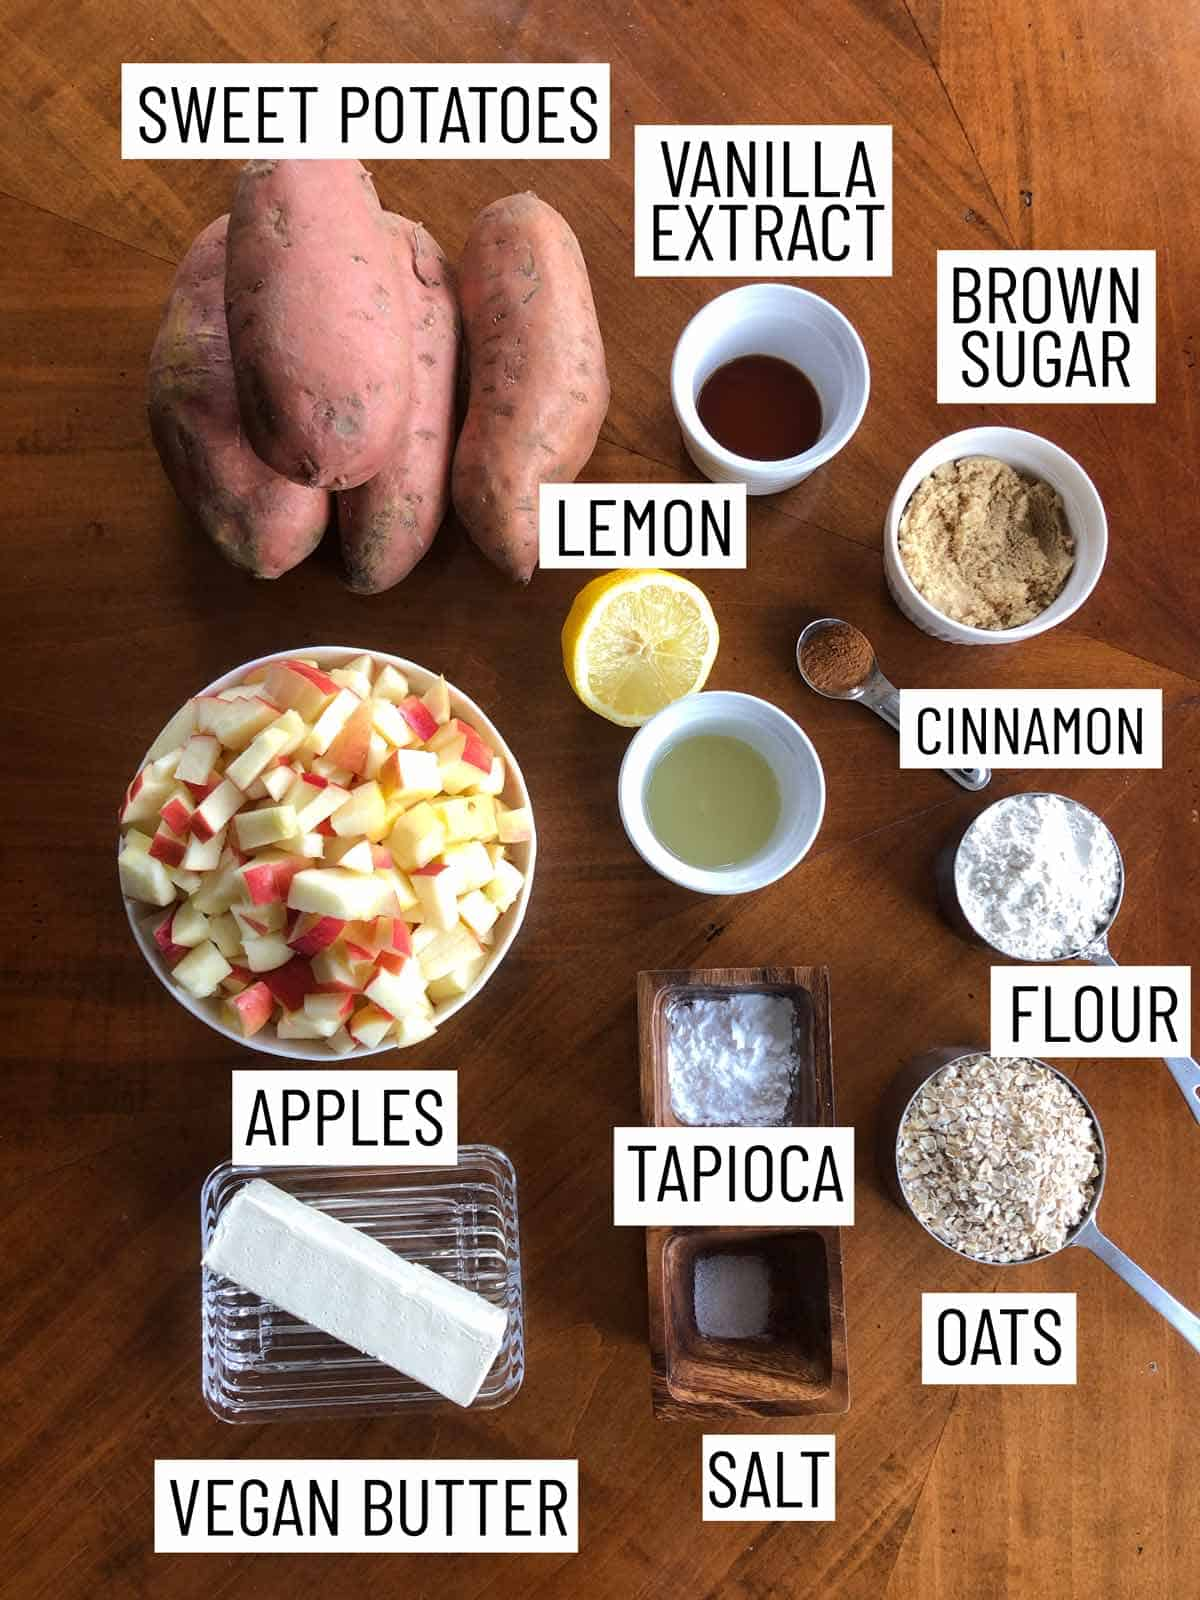 Overhead photo of ingredients containing yams, vanilla extract, brown sugar, cinnamon, lemon, flour, apples, tapioca, oats, salt, and vegan butter.